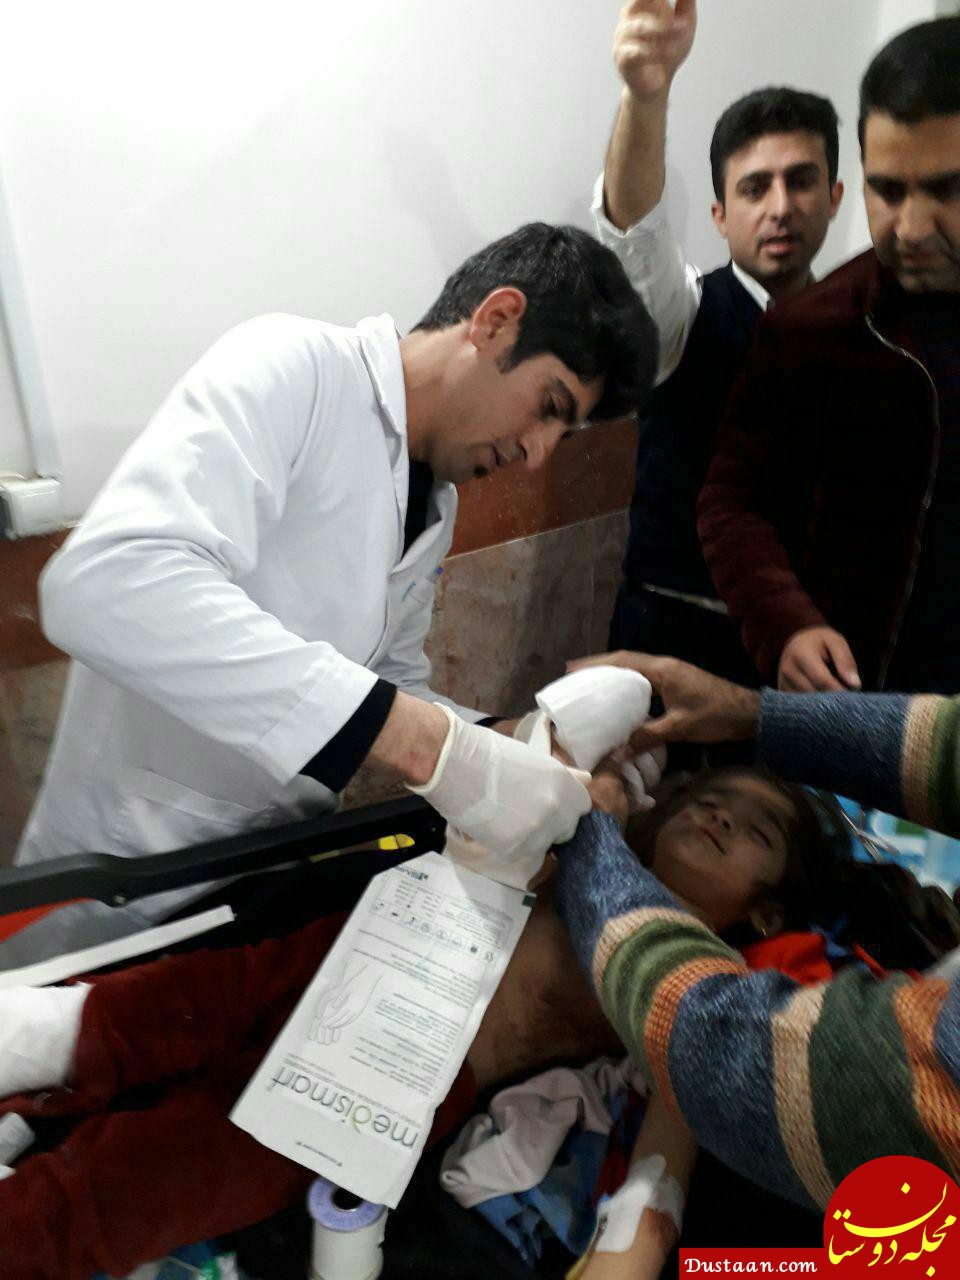 www.dustaan.com پیوند موفقیت آمیز دست کودک خردسال +عکس